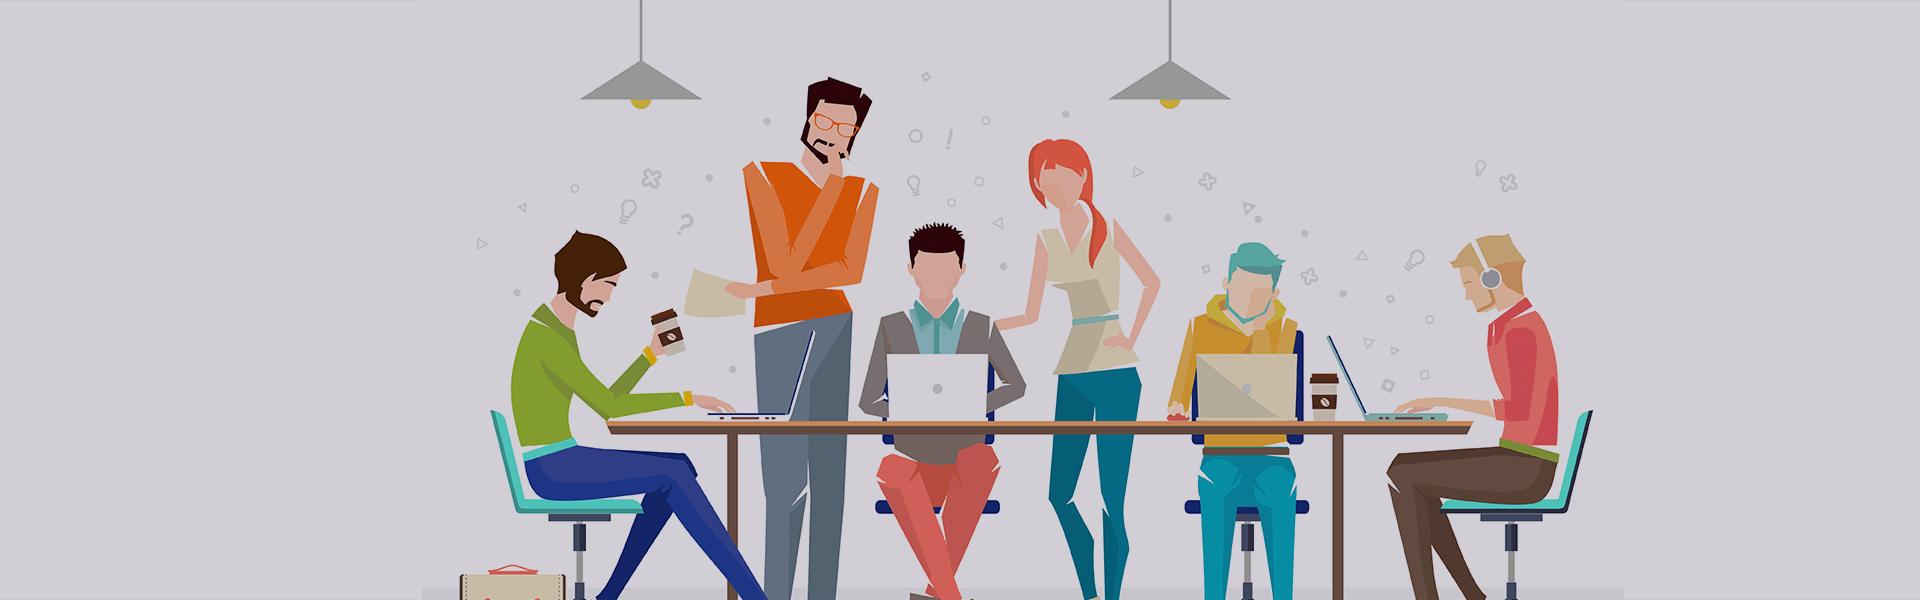 hangout agile network